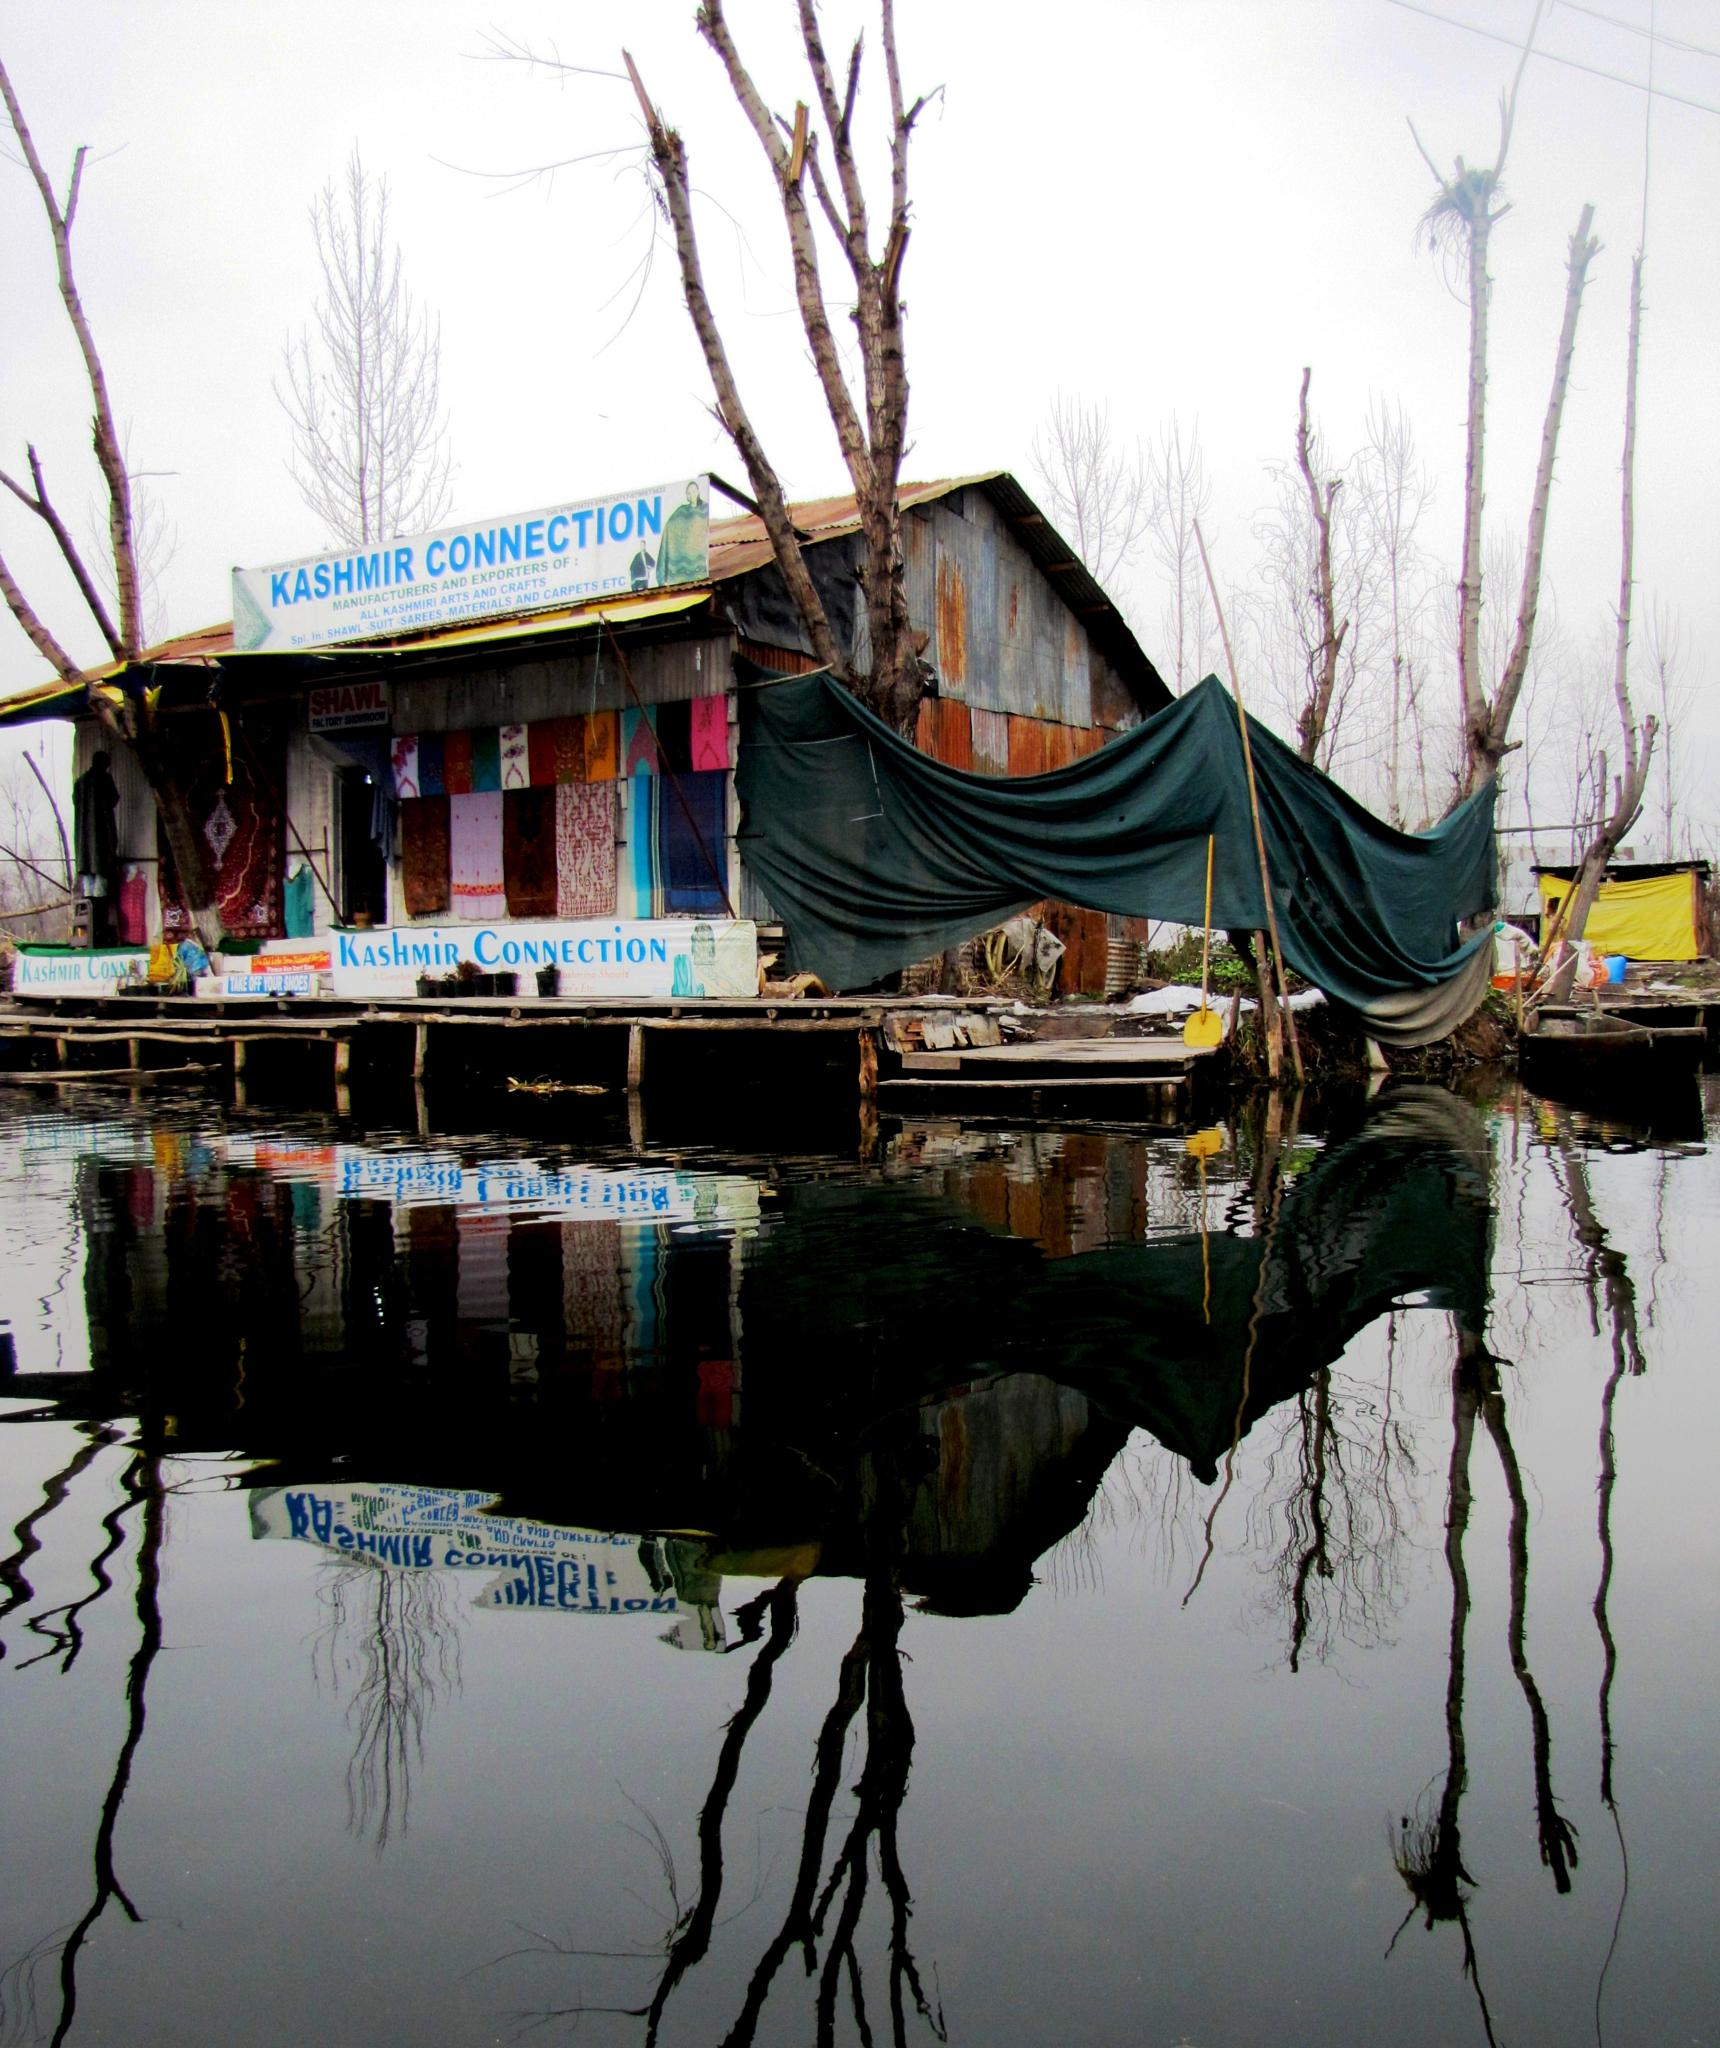 Reflections by kanwar.rajput.5